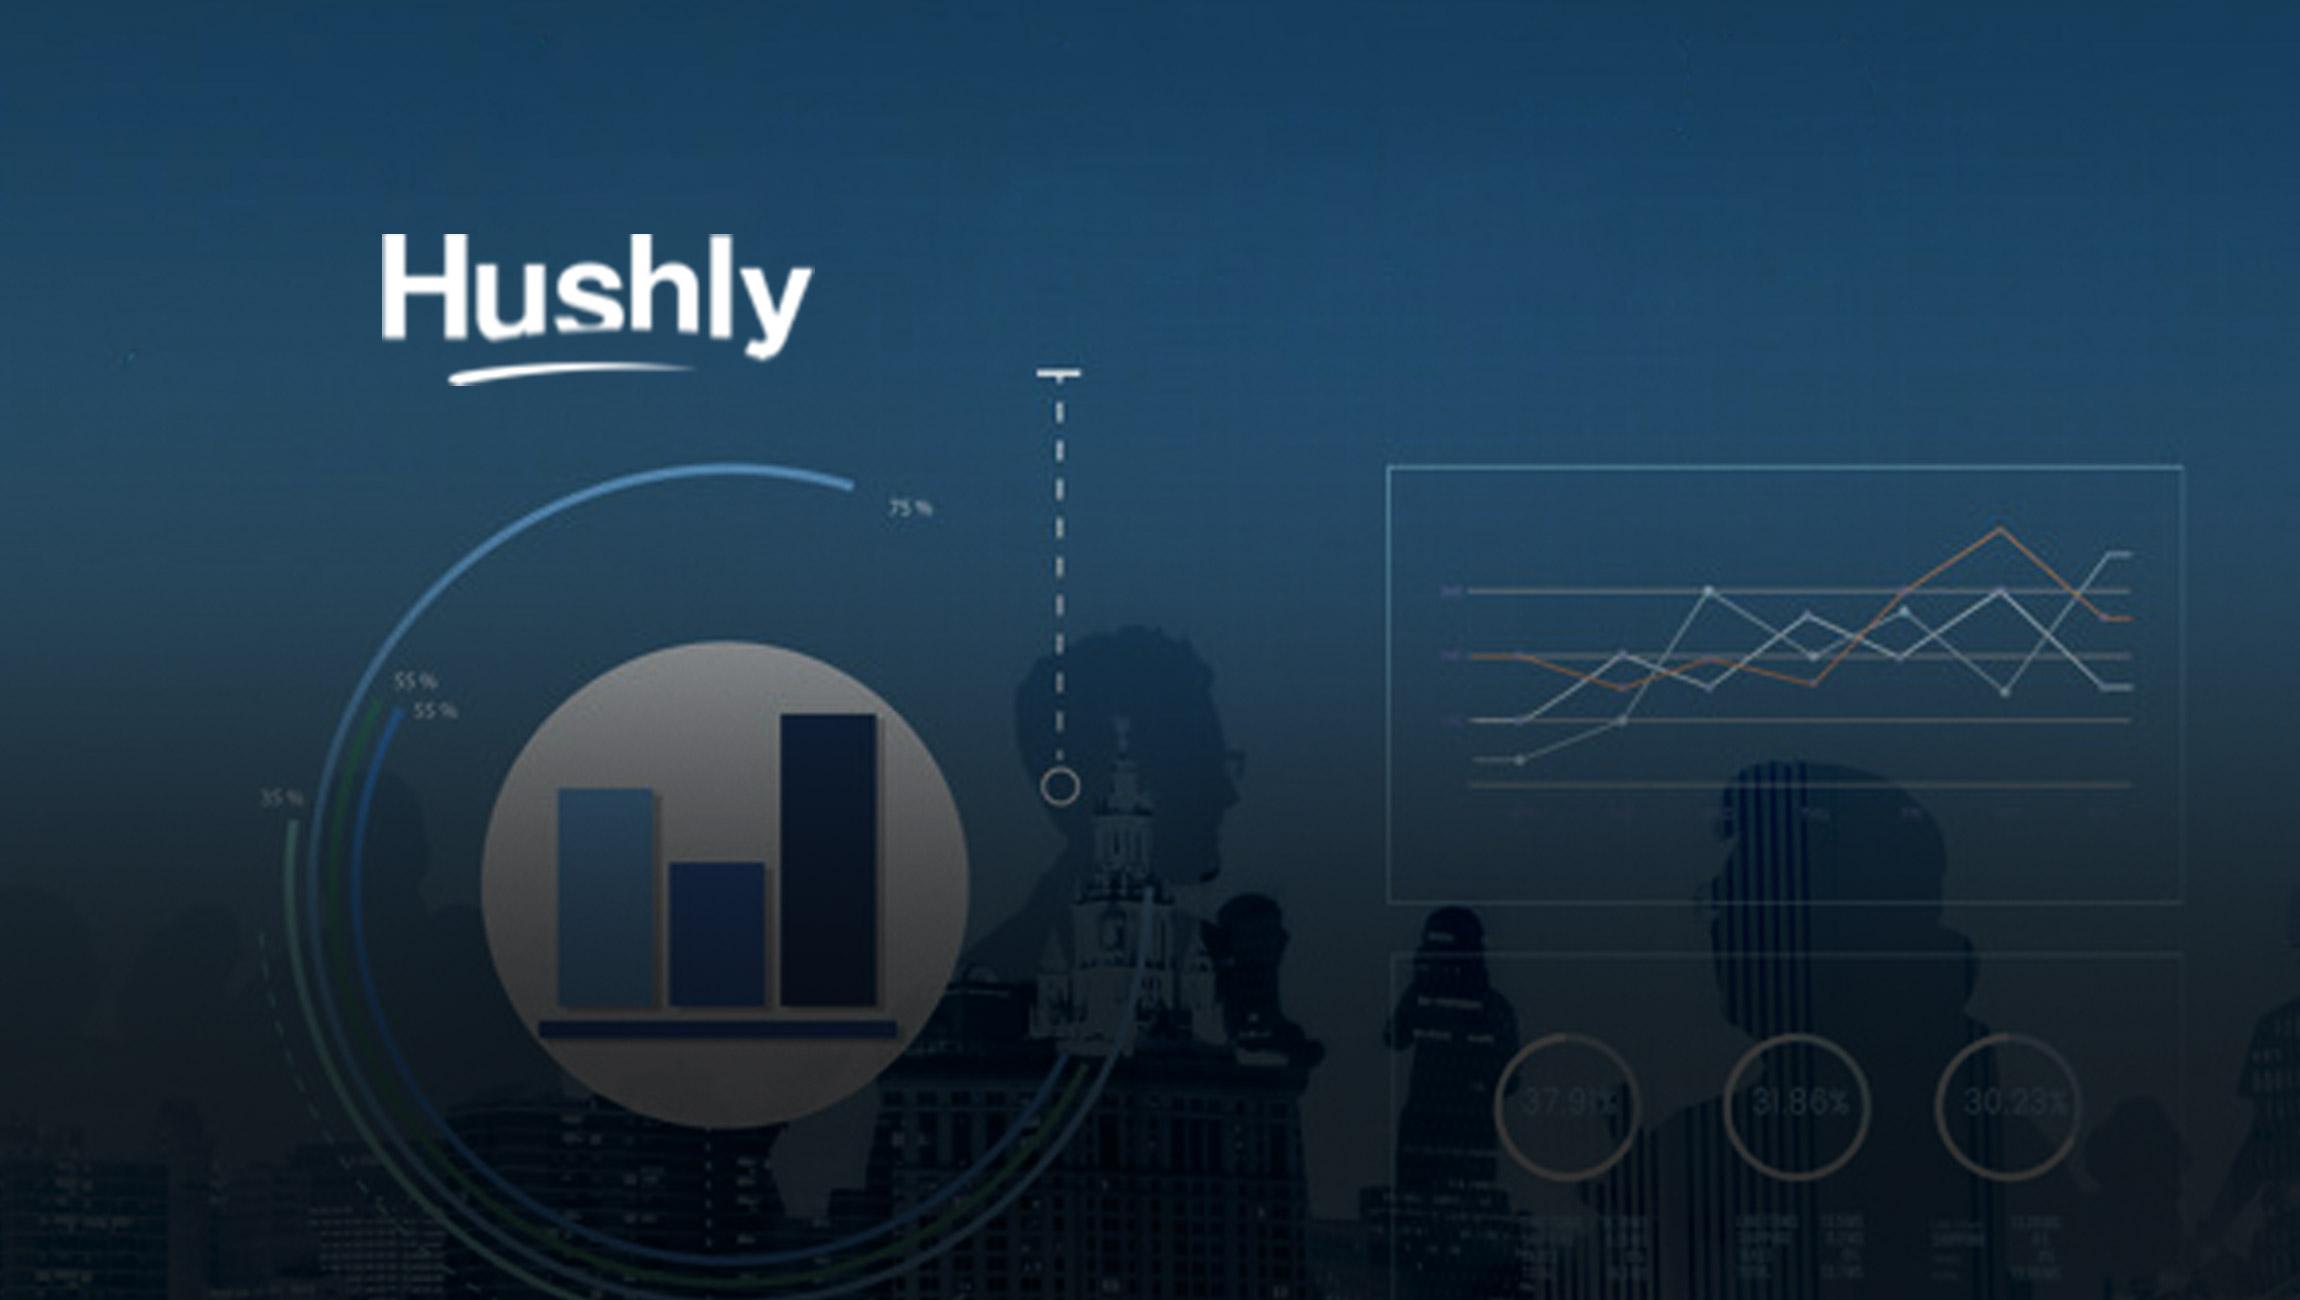 Hushly's SaaS Platform Develops Artificial Intelligence Technology for B2B Marketers